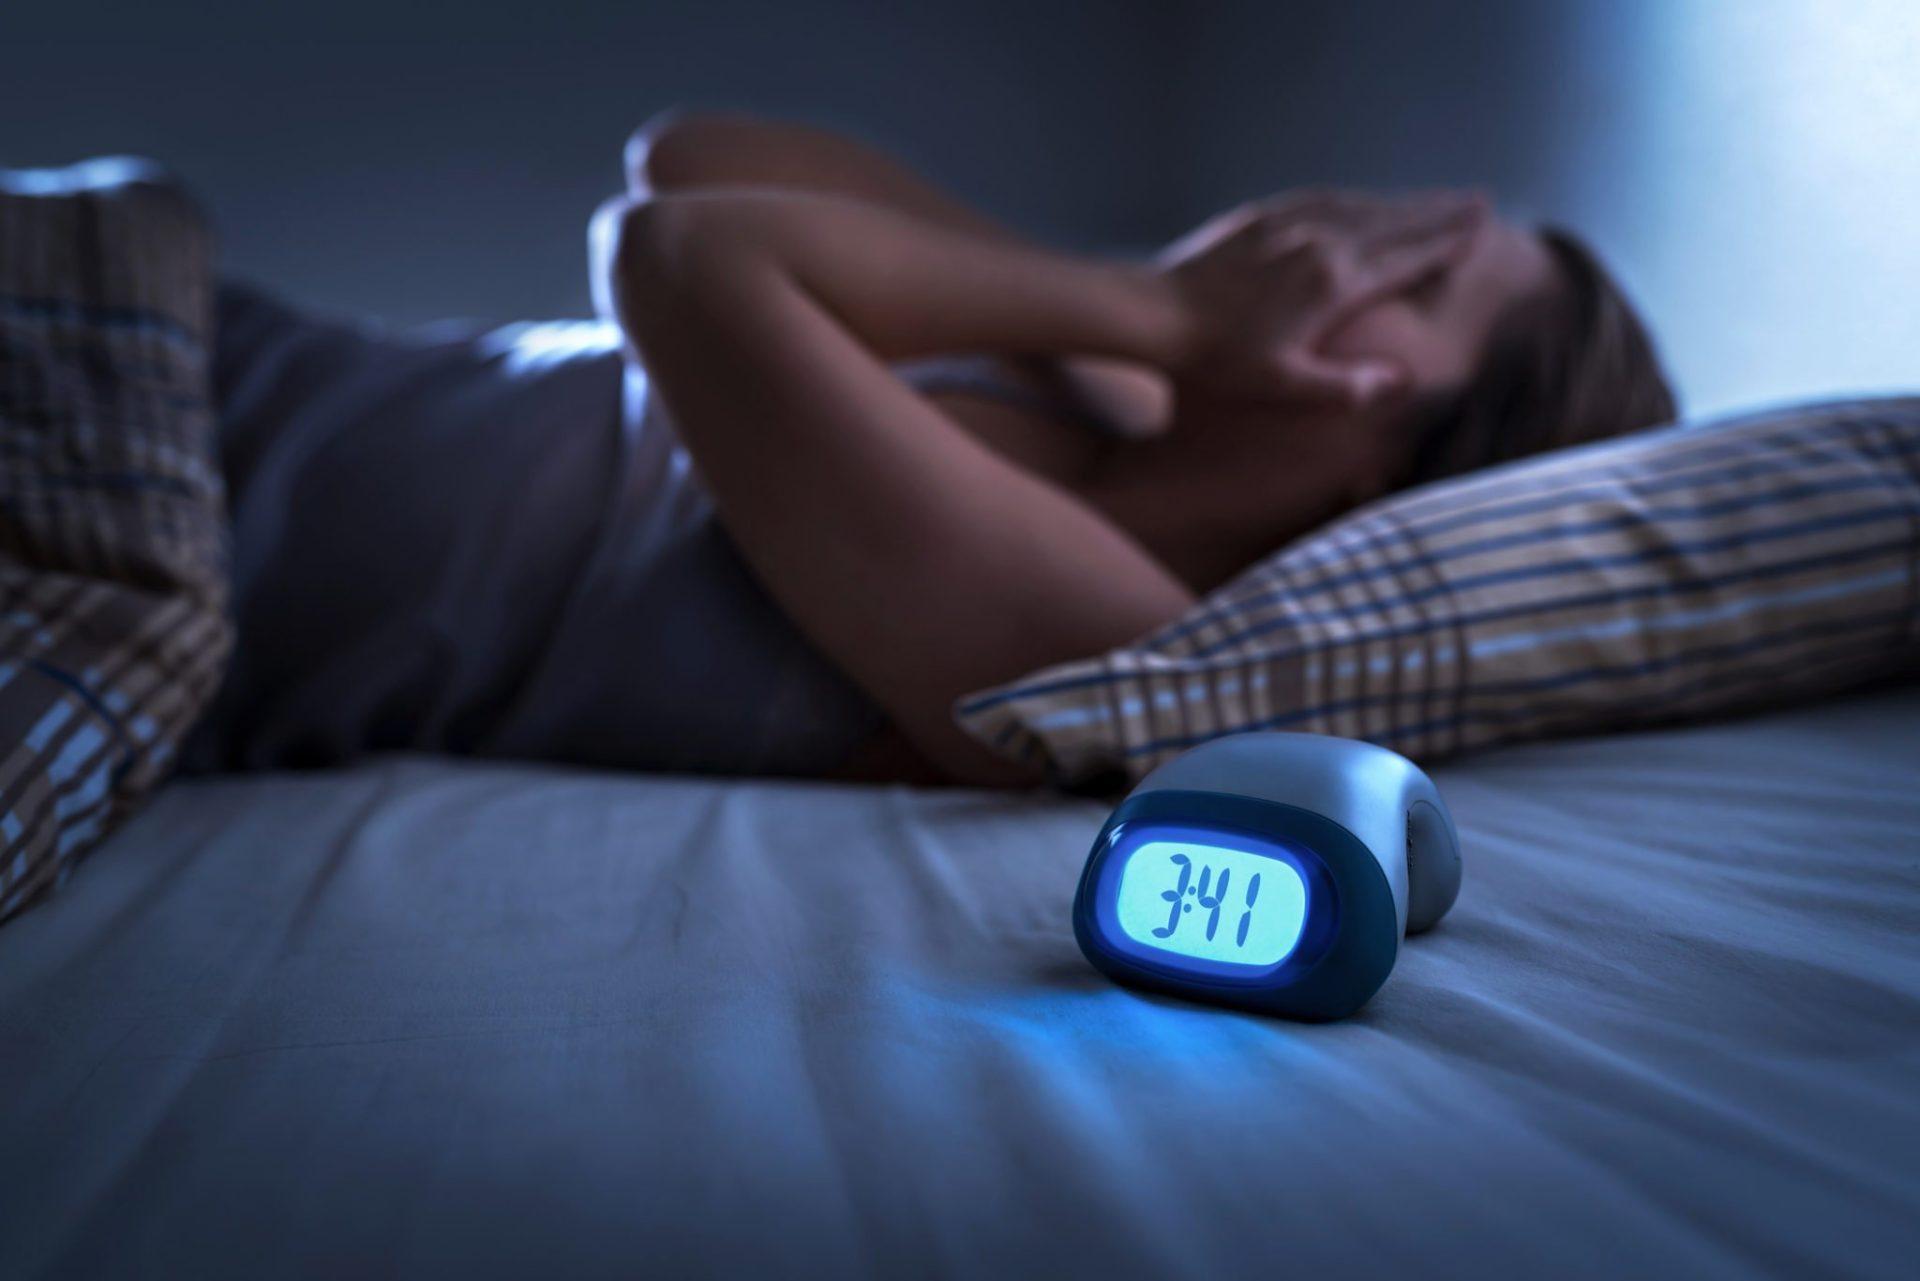 cât de mult pierdeți somnul